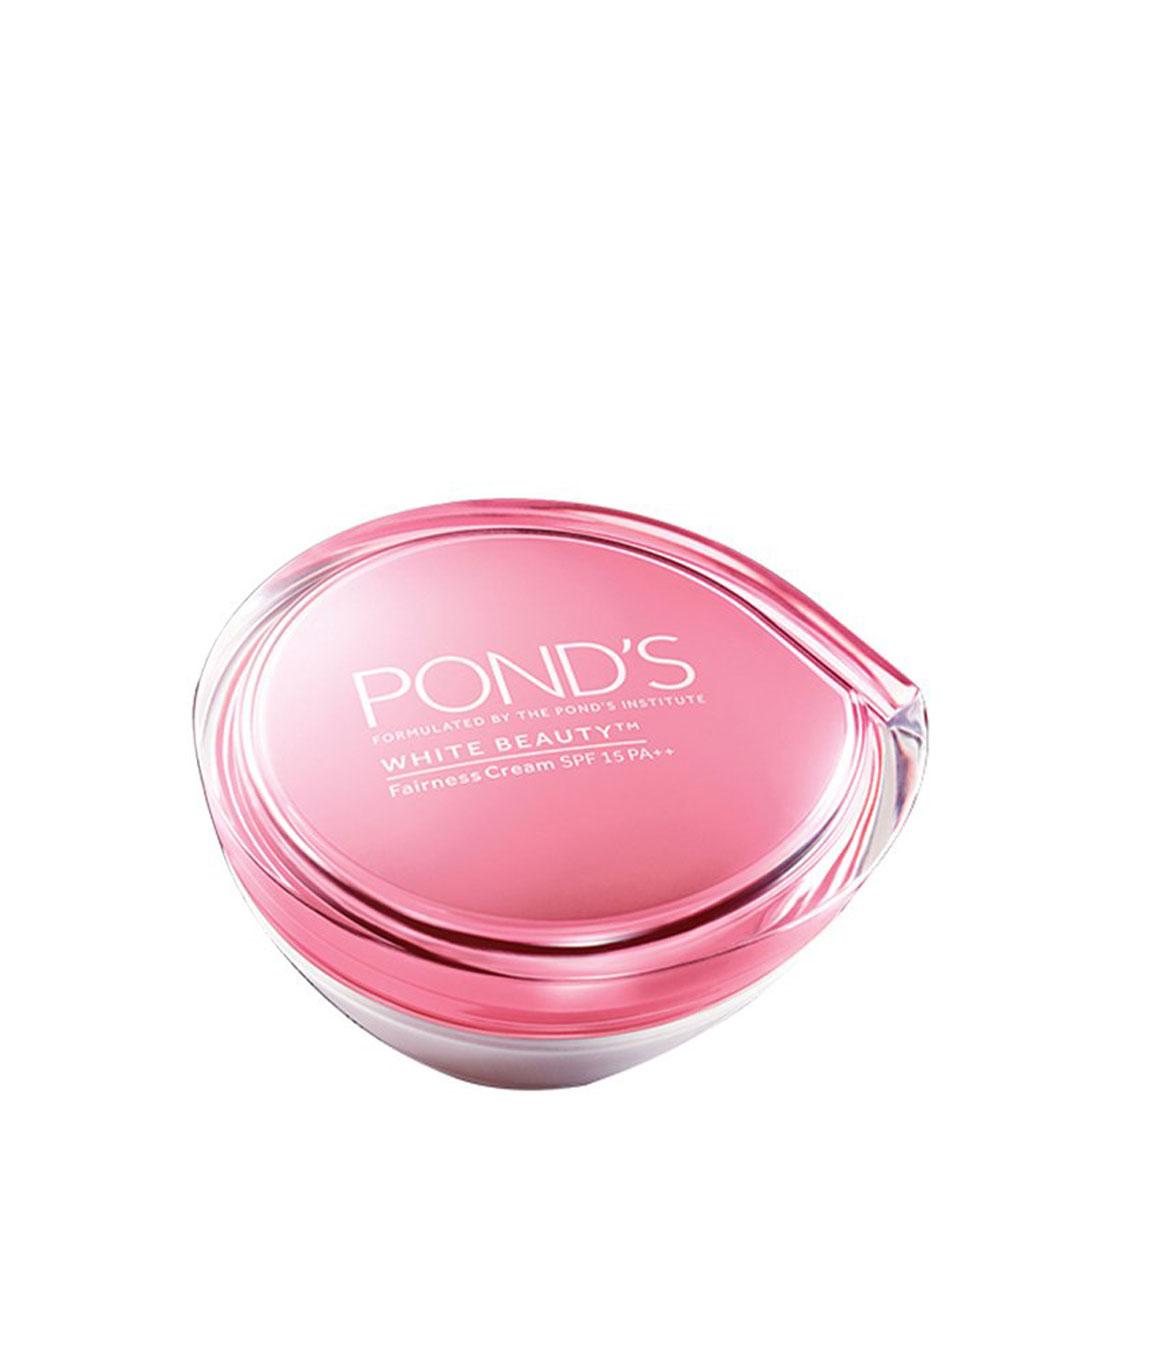 PONDS White Beauty SPF 15 PA Anti-Spot Fairness Cream, 50gm